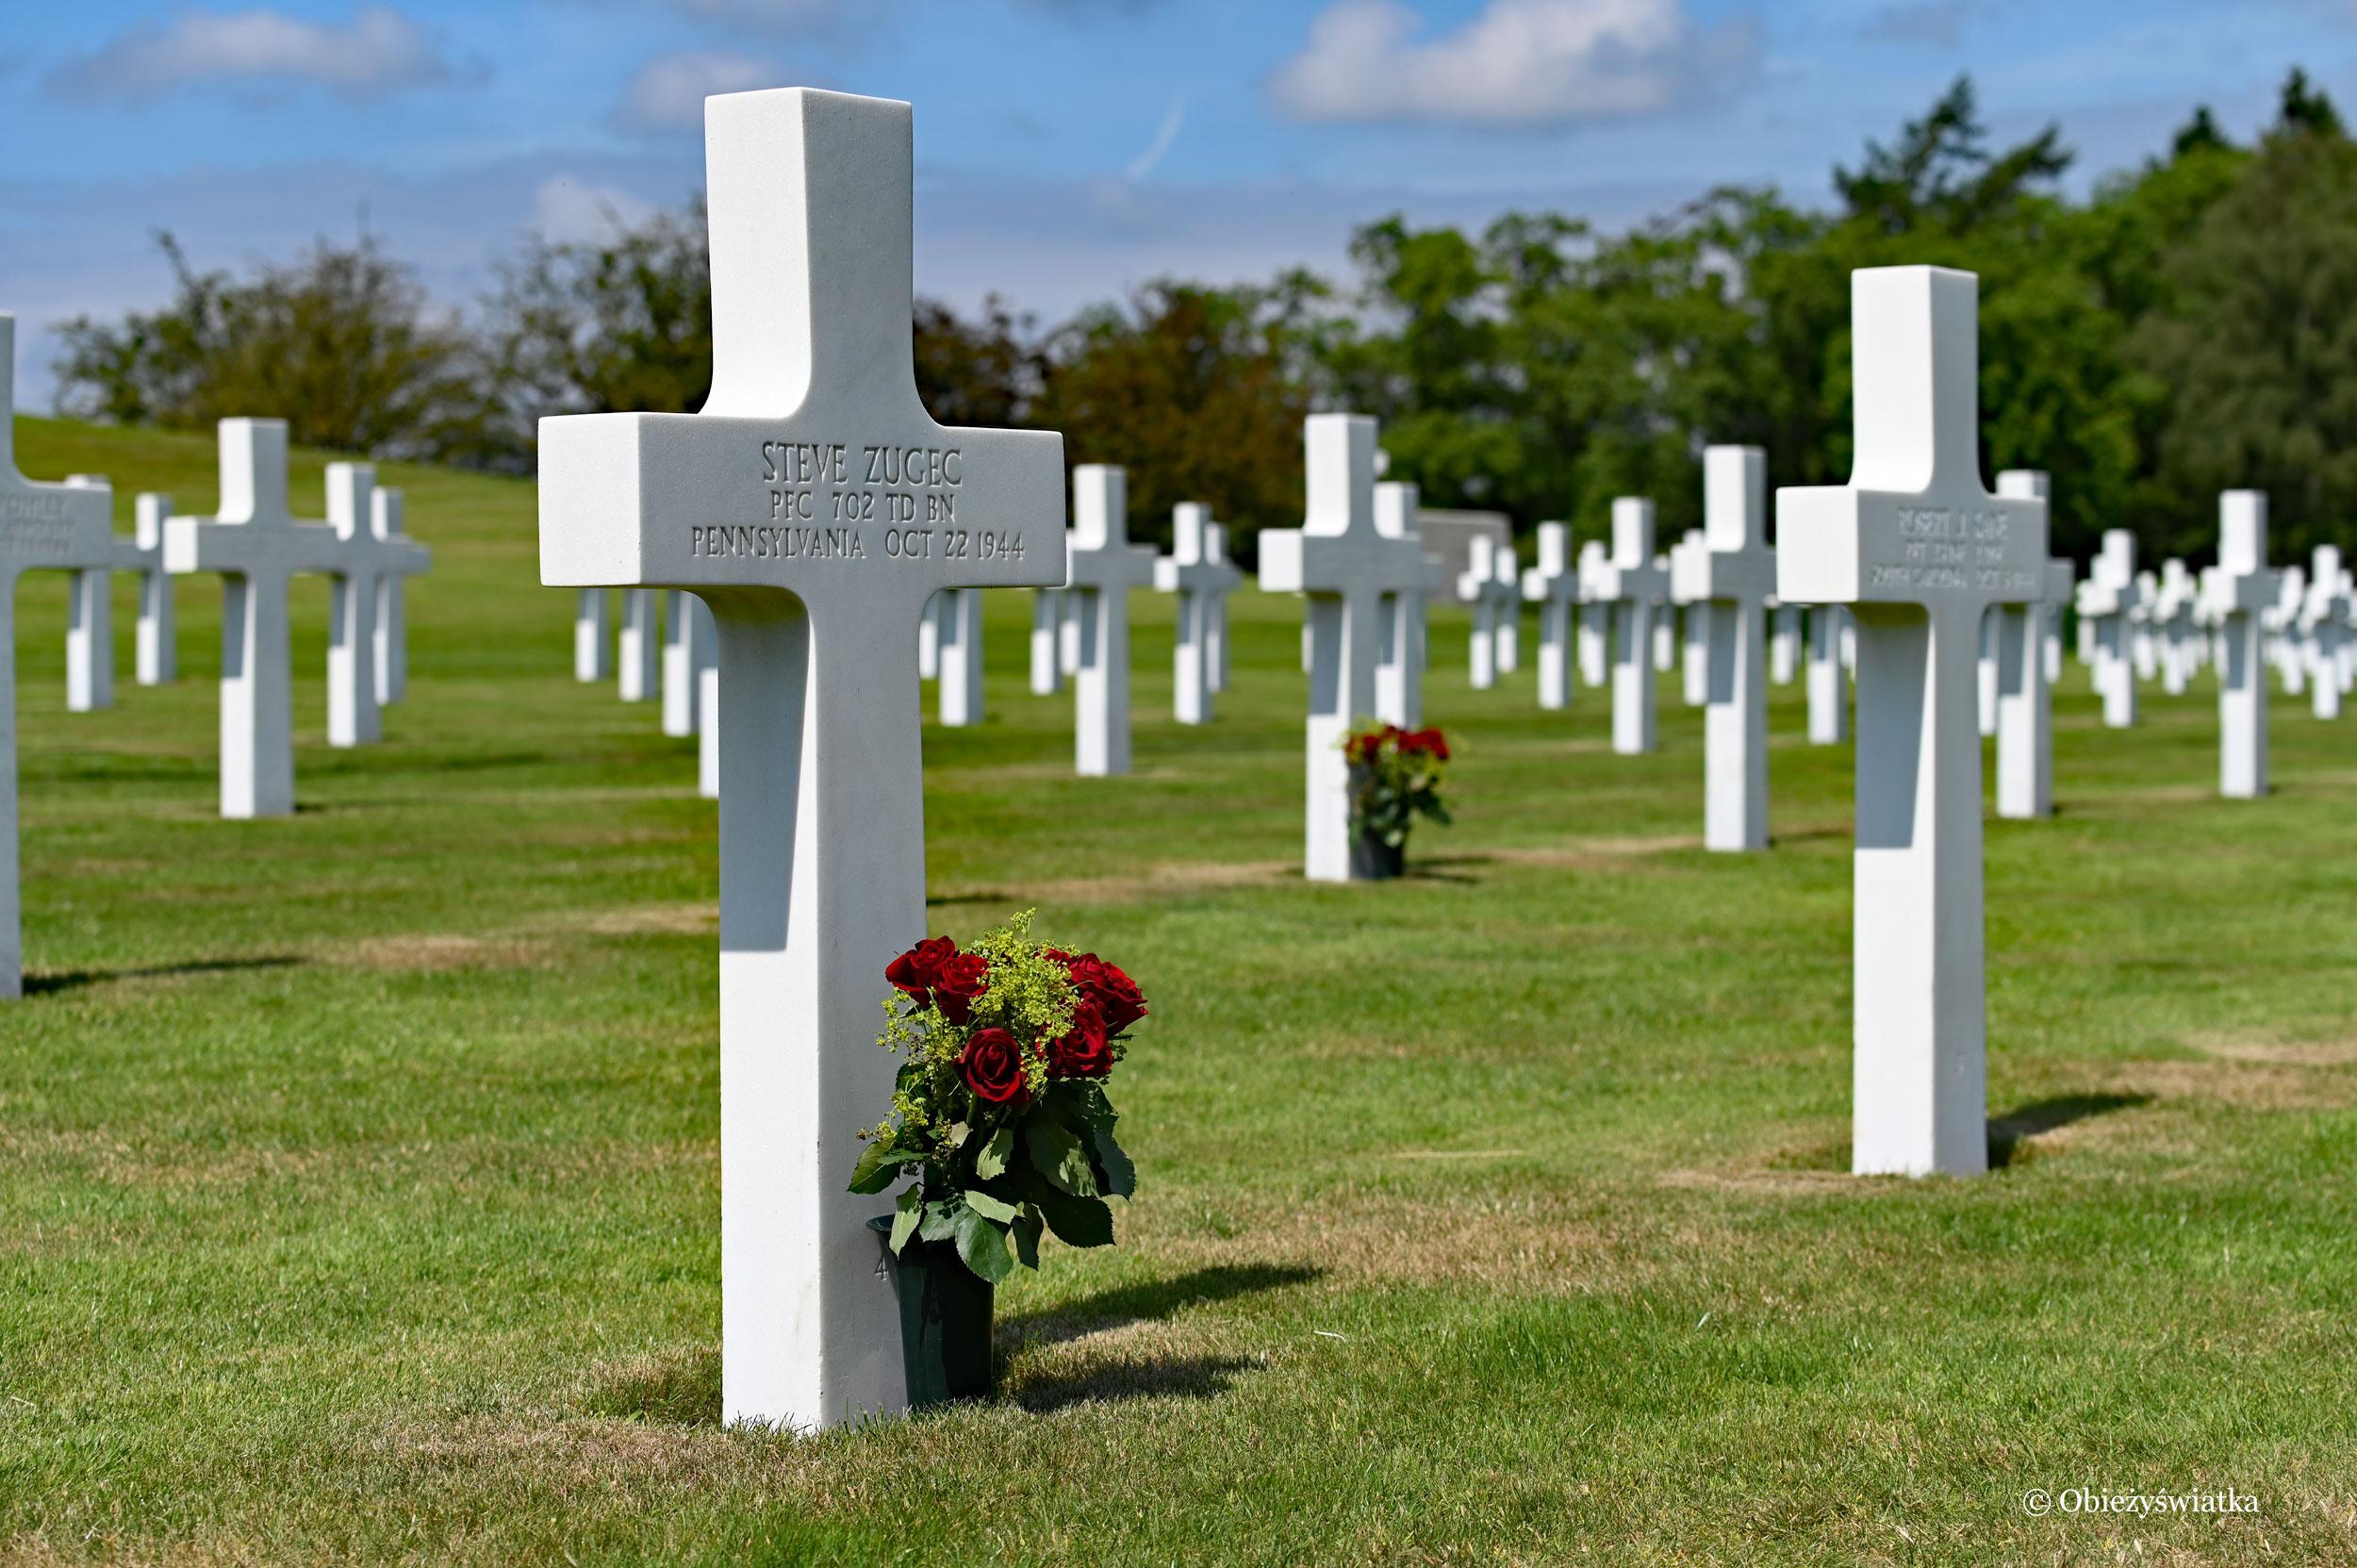 American Cementery and Memorial, Belgia